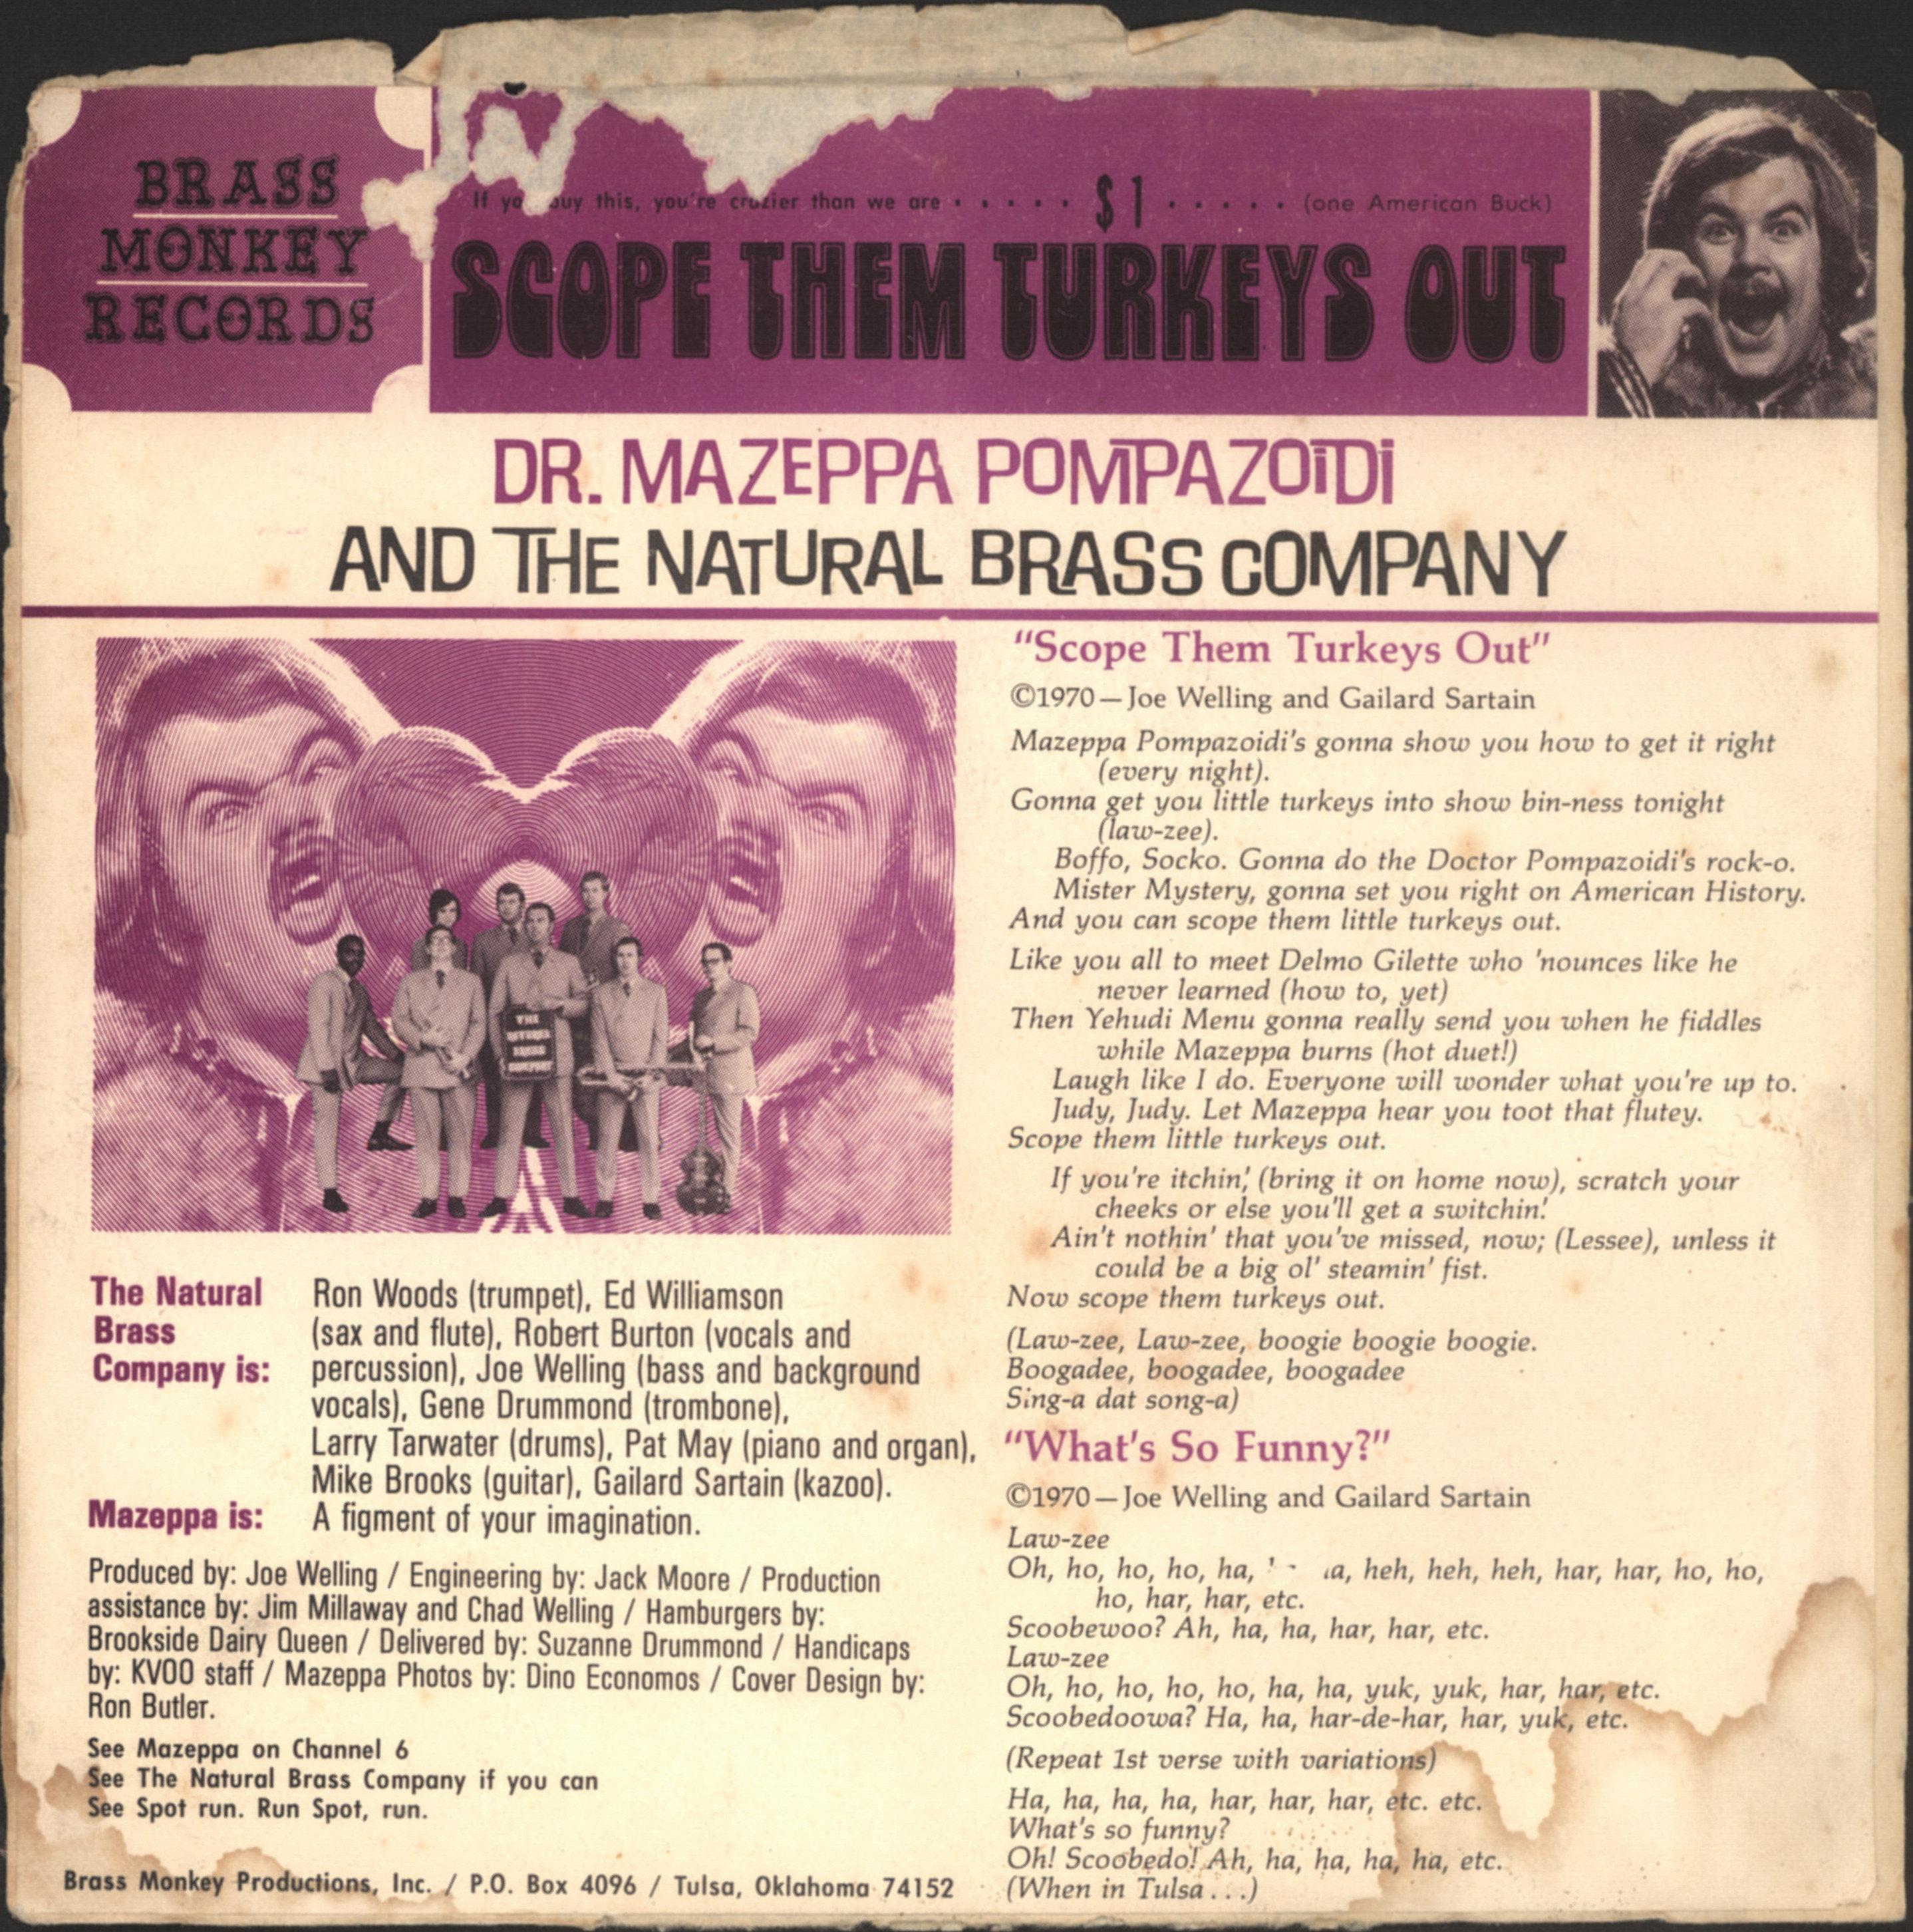 Natural Brass Company featuring Dr. Mazeppa Pompazoidi, Scope Them Turkeys Out (Brass Monkey BMR-107.01-A)